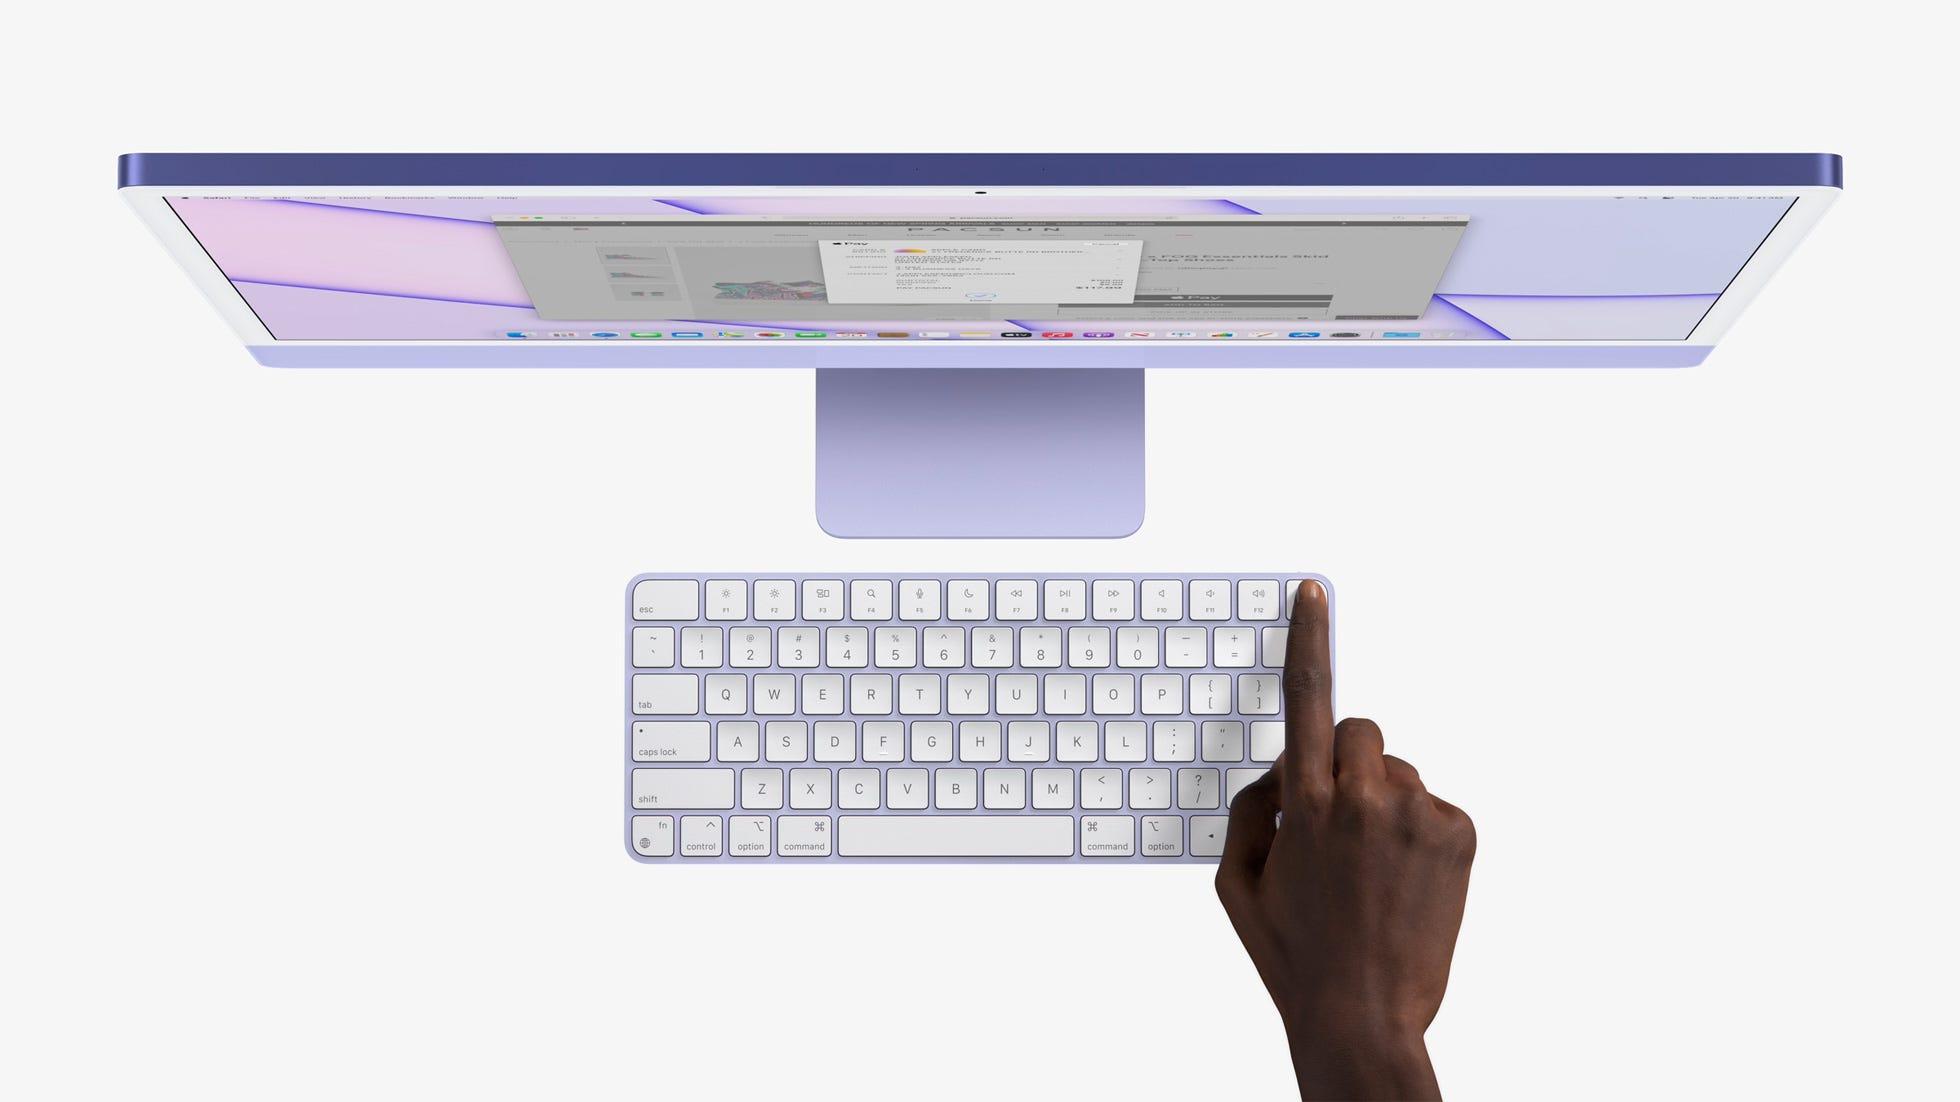 Purple iMac and keyboard